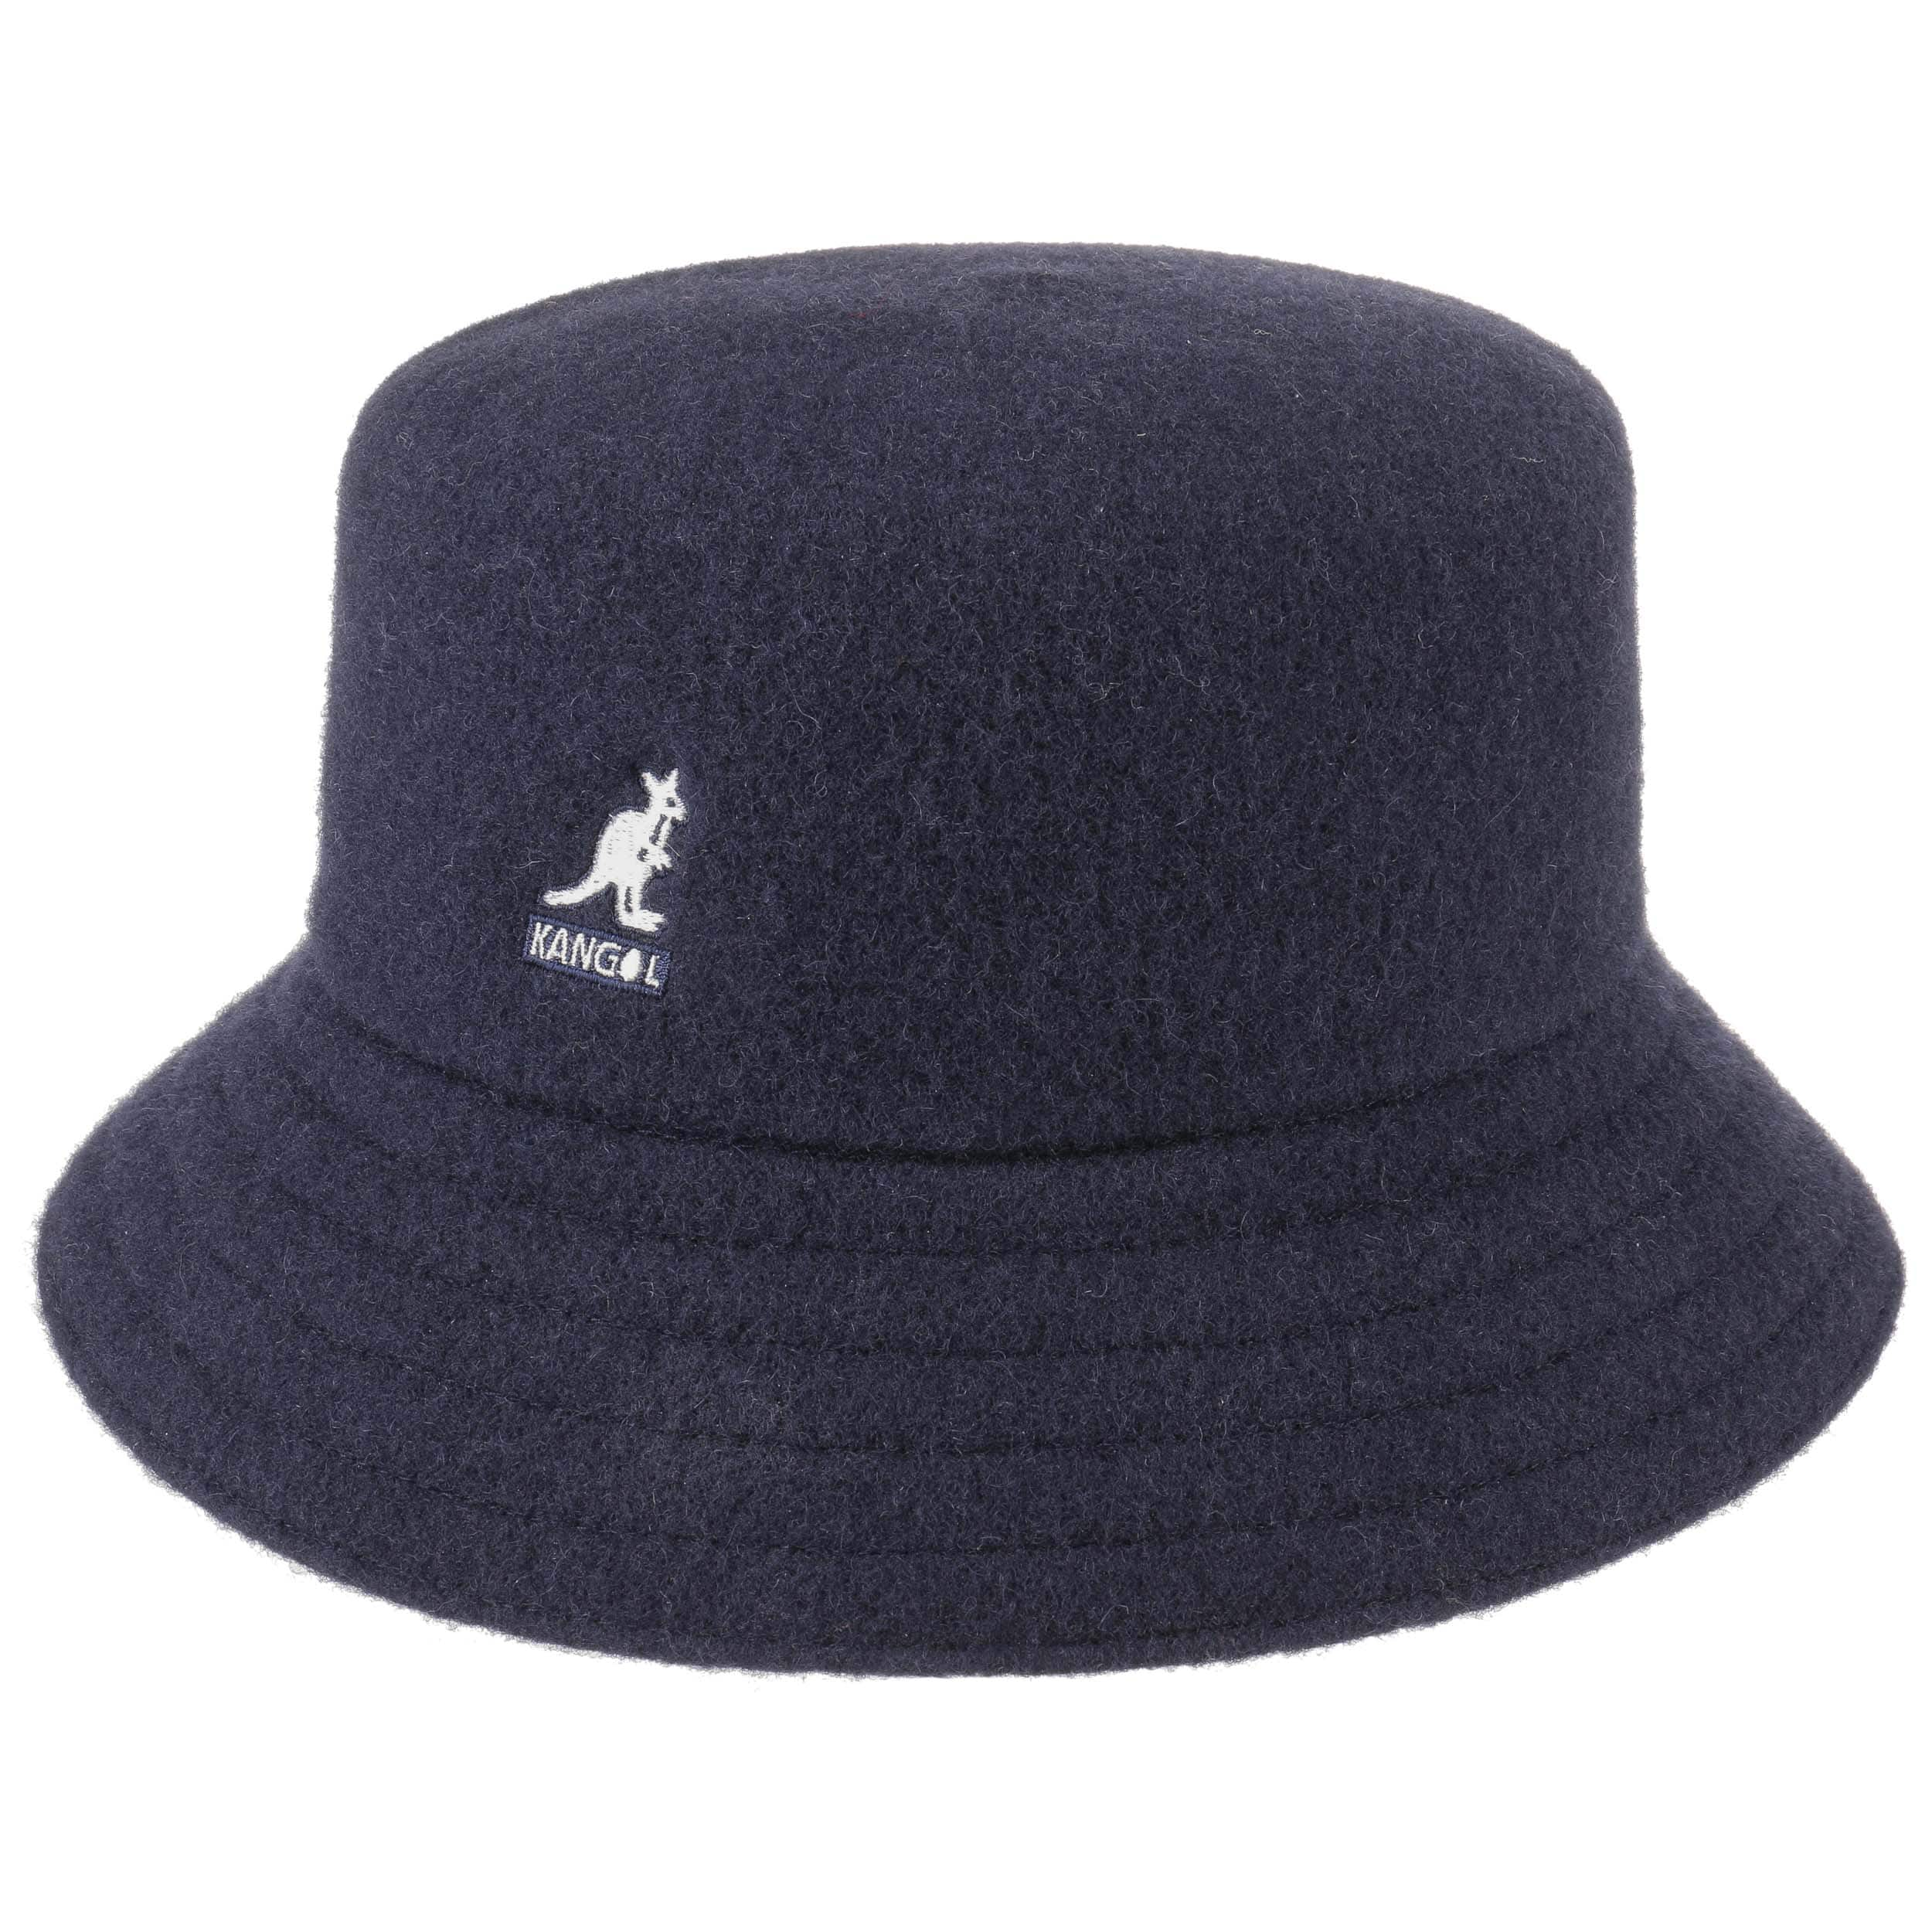 Sombrero Wool Lahinch by Kangol - Sombreros - sombreroshop.es d5789f9c065